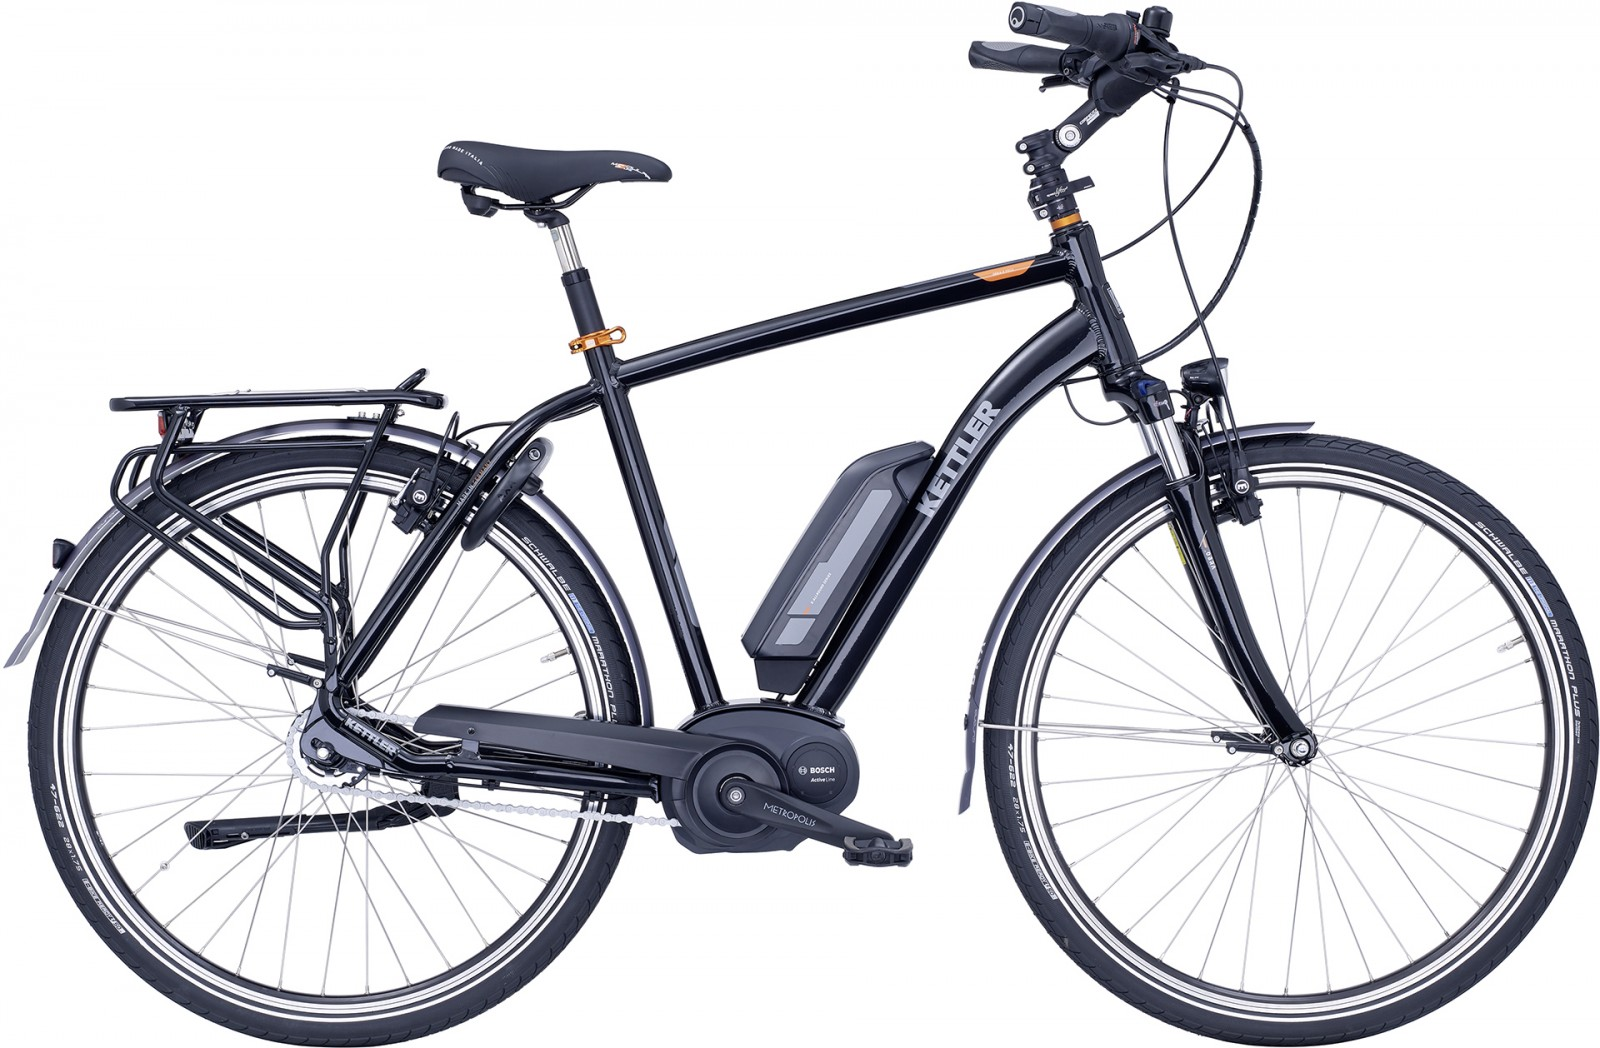 kettler e bike obra ergo fl diamant 28 zoll sport tiedje. Black Bedroom Furniture Sets. Home Design Ideas